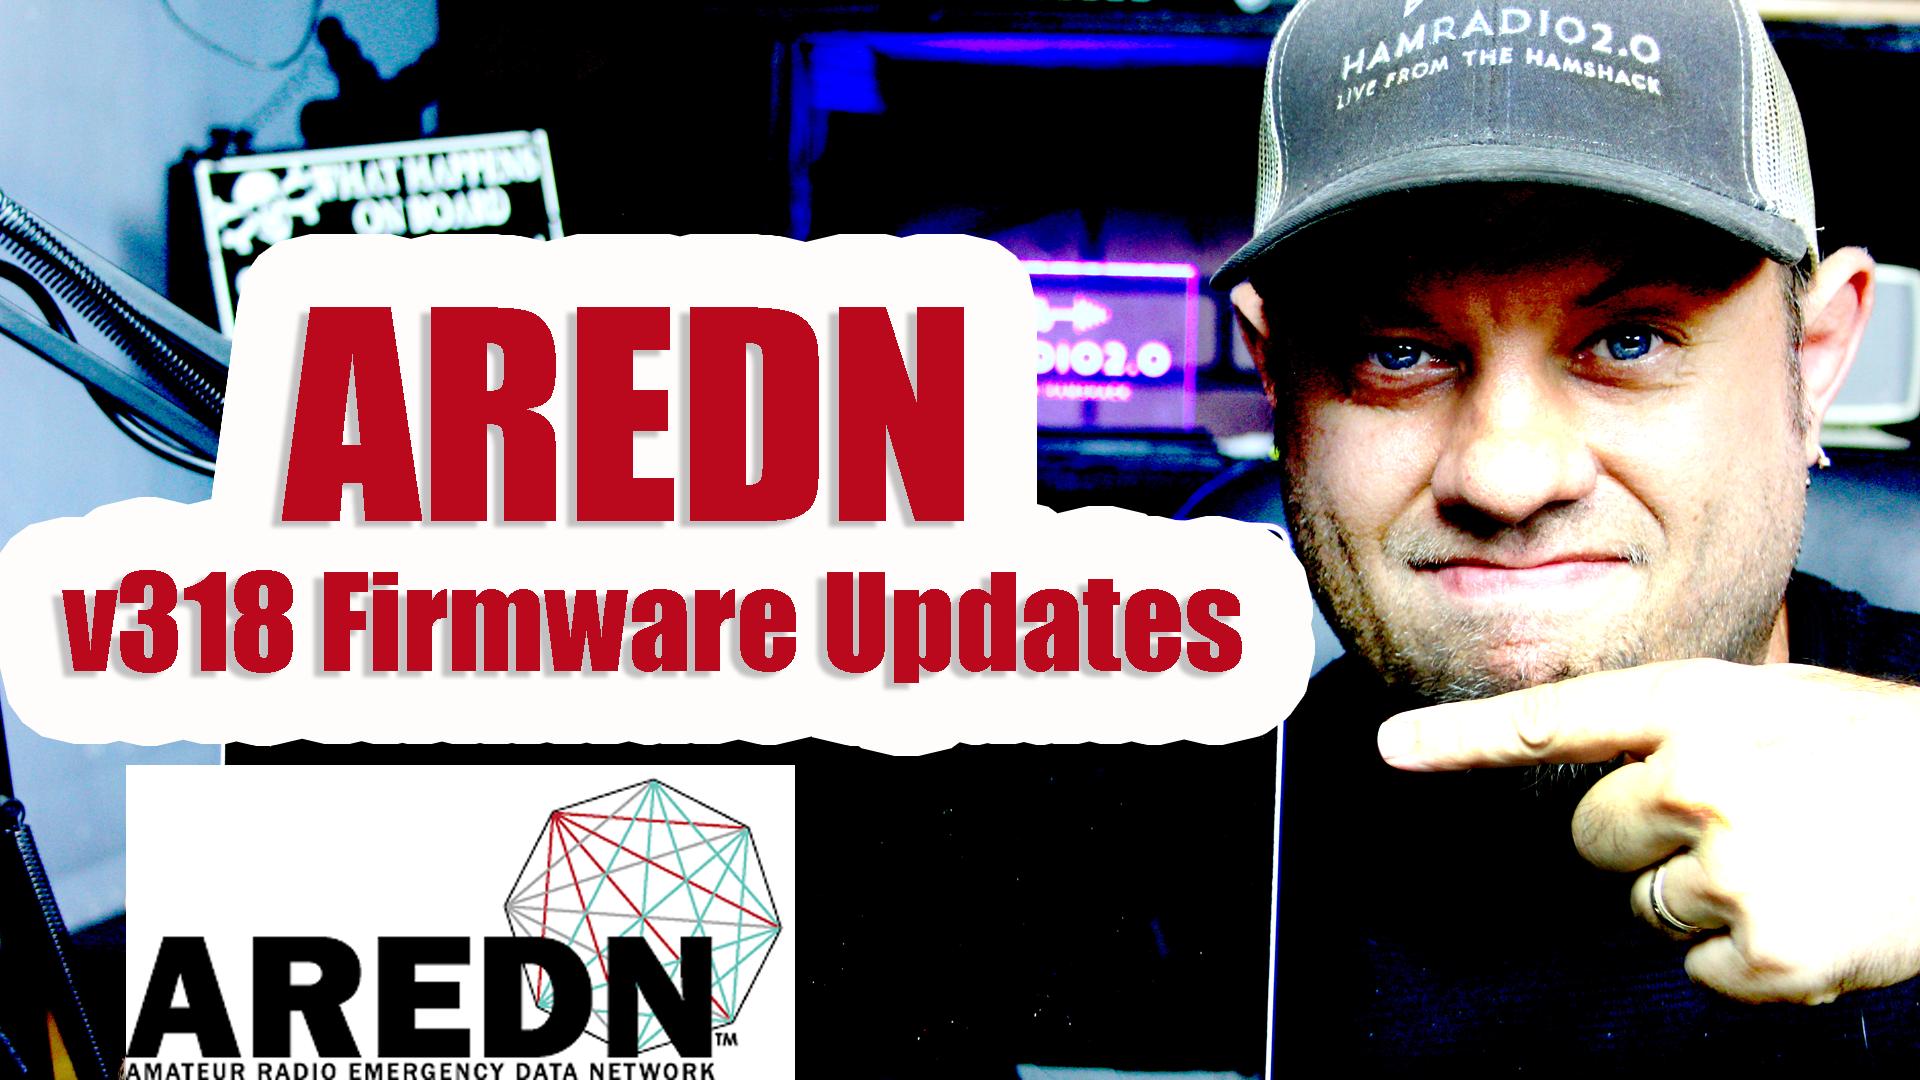 Episode 159: AREDN v318 Firmware Updates